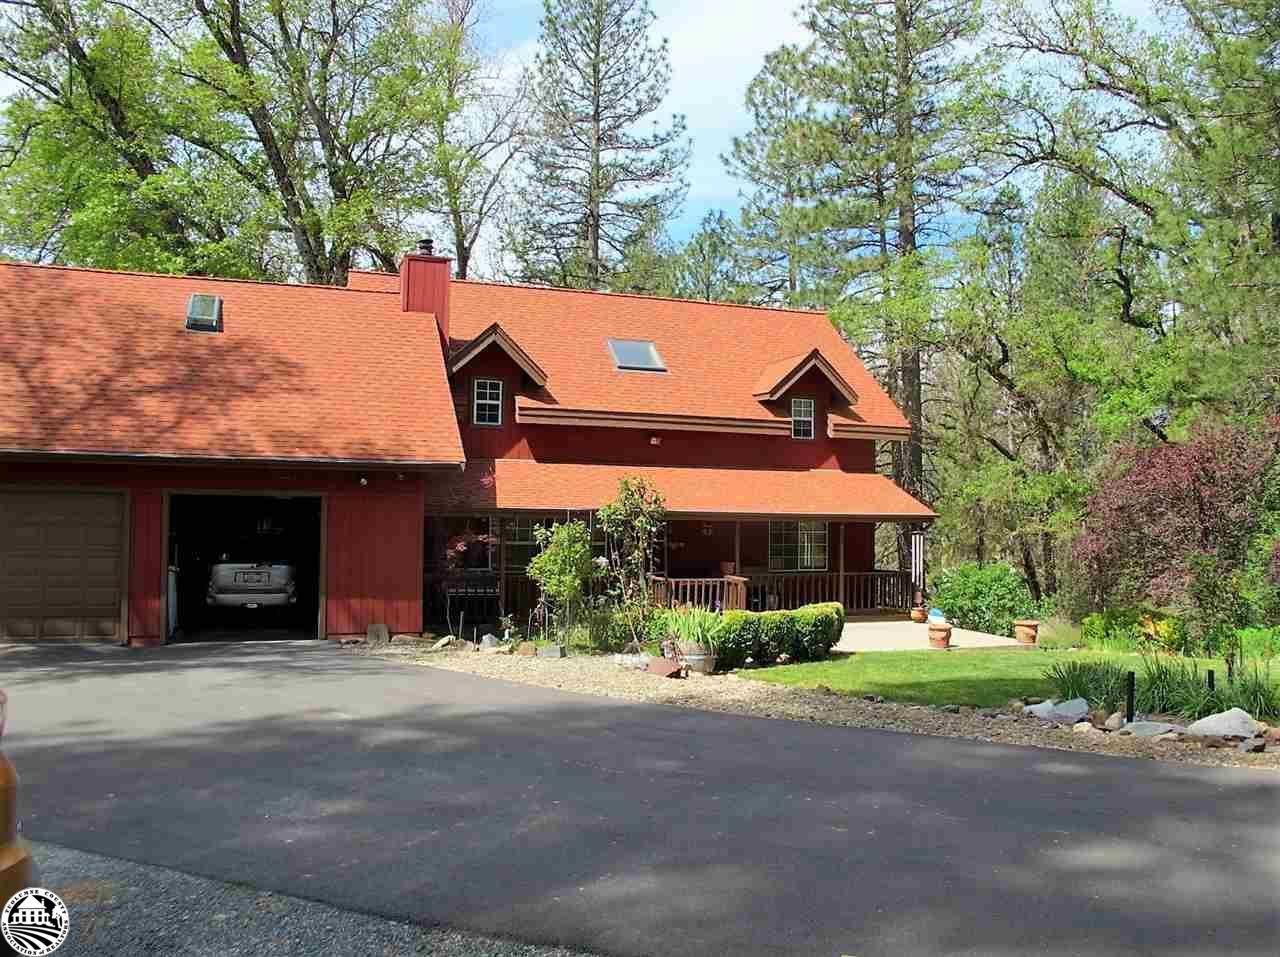 11350 Big Creek Shaft Rd, Groveland, CA 95321